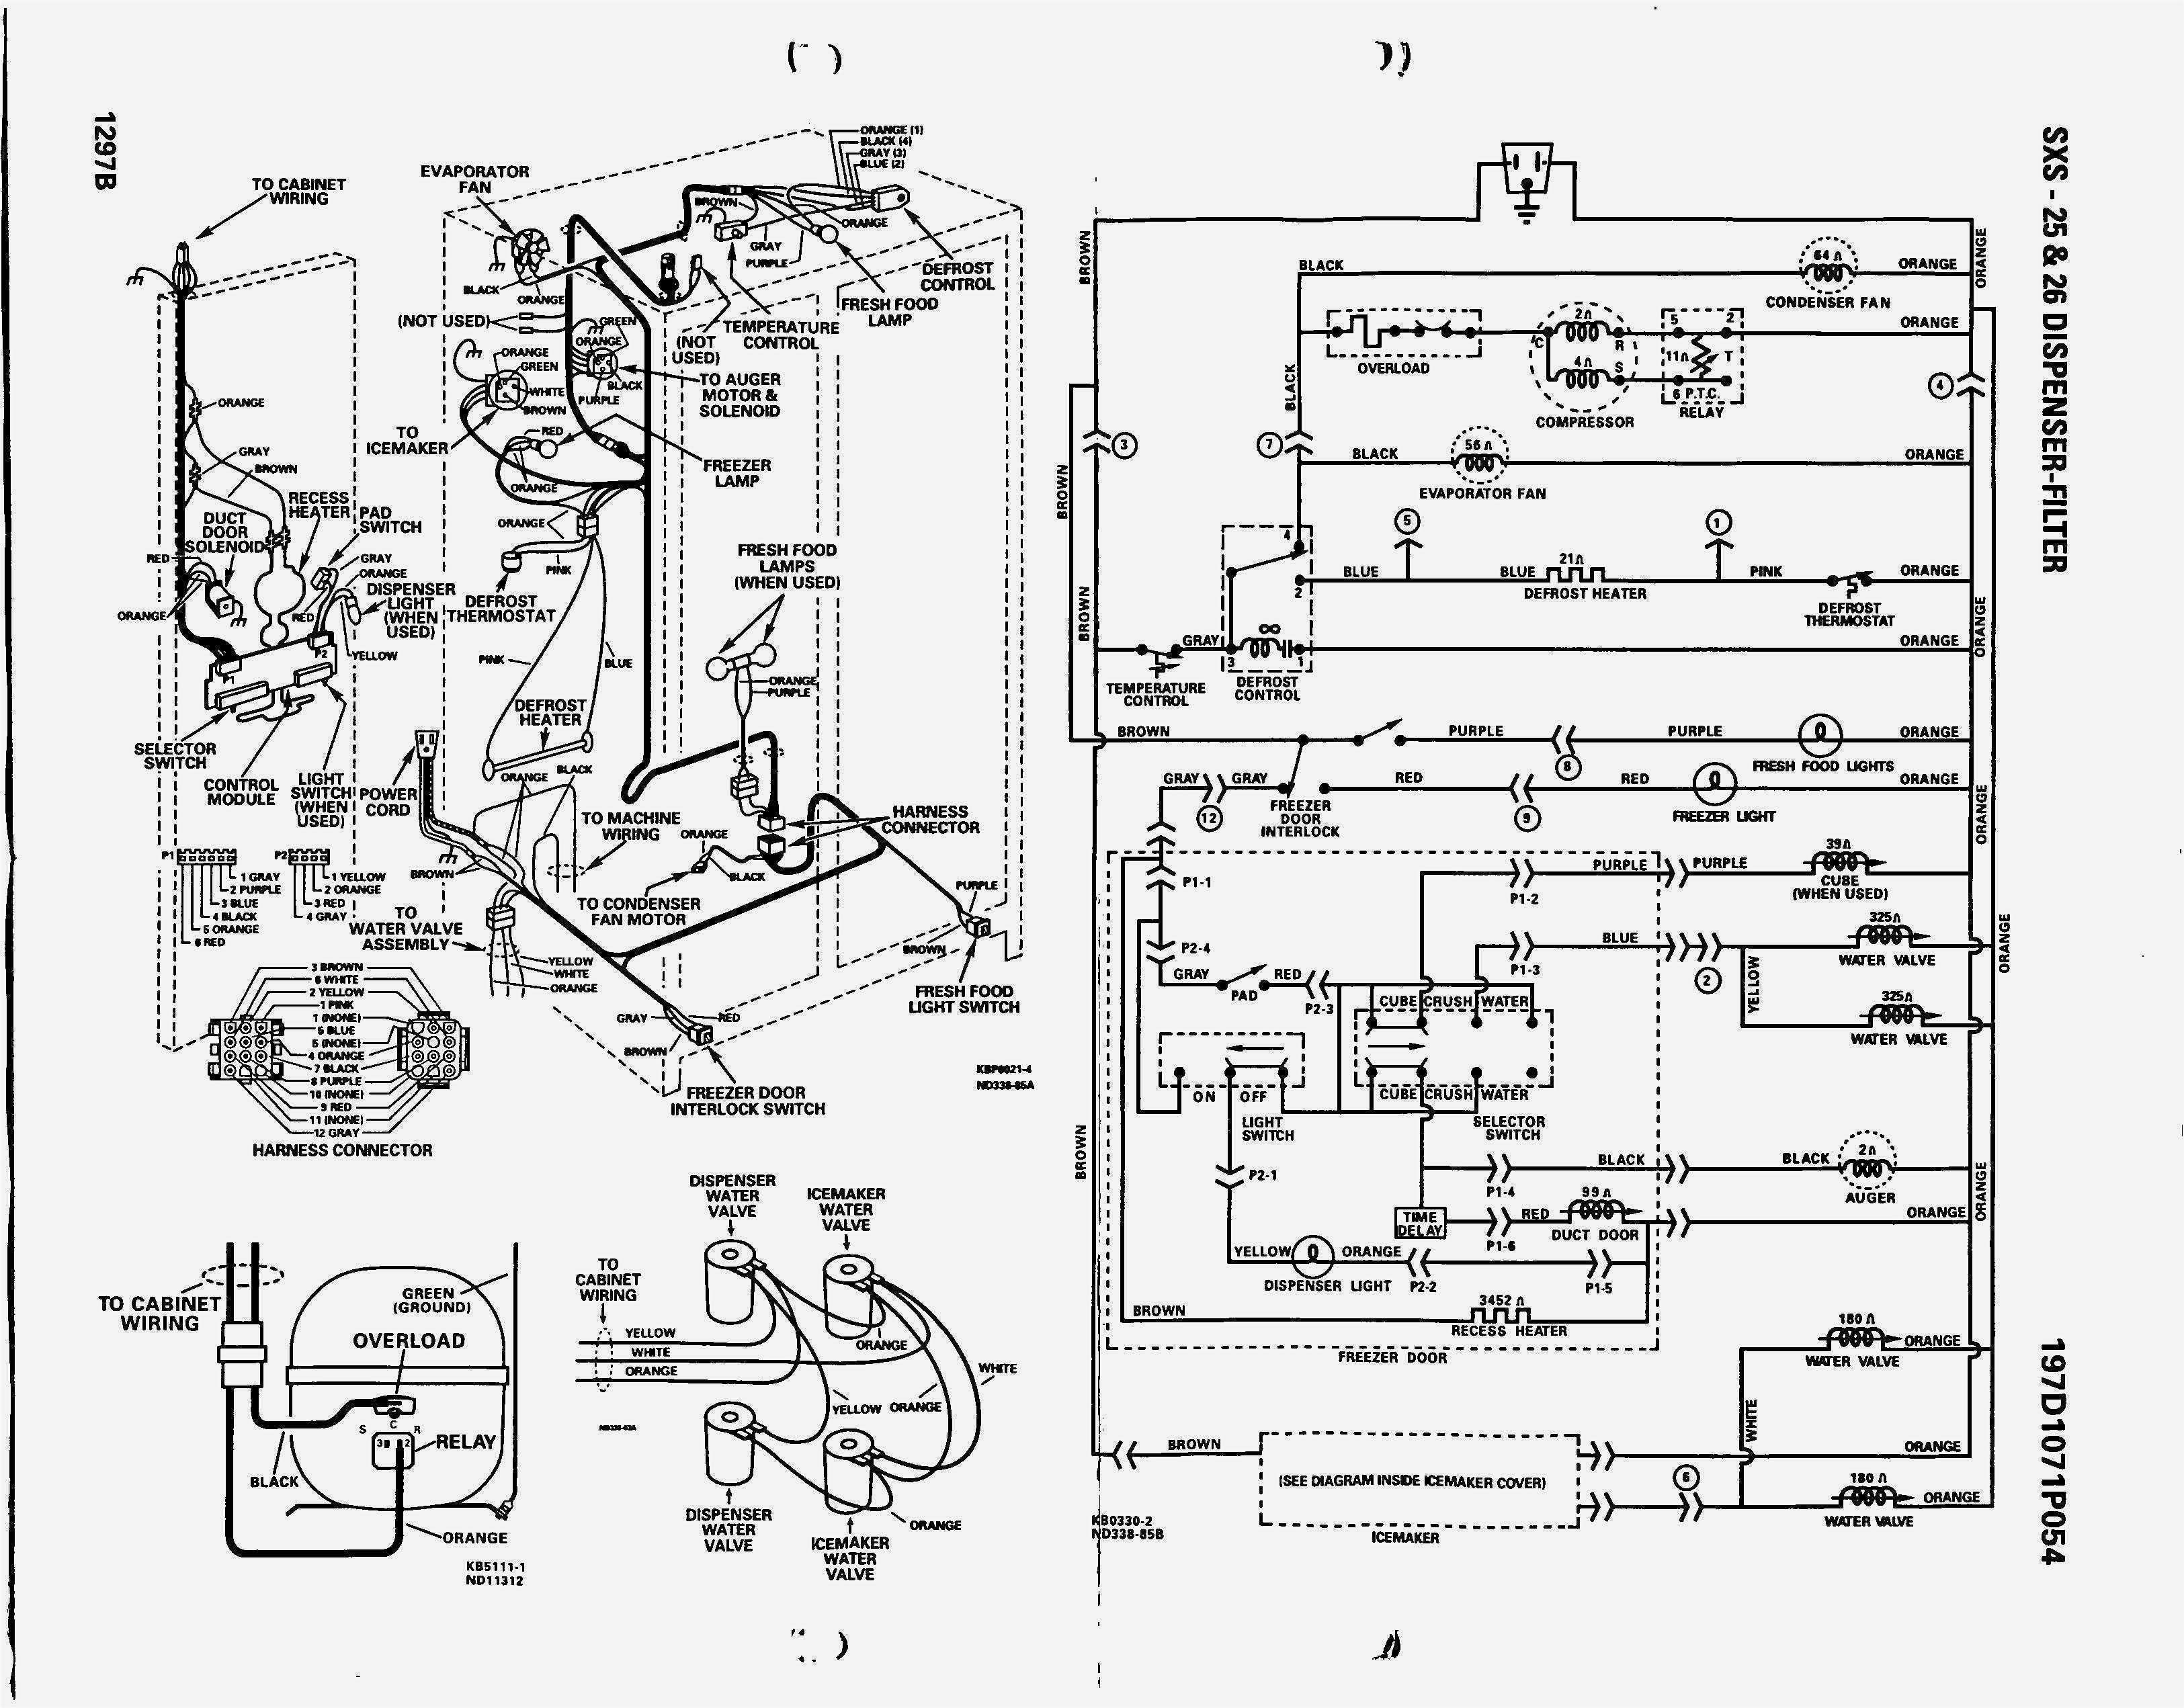 Pump Control Panel Wiring Diagram 2007 Ford Focus Fuse | Wiring Diagram - Franklin Electric Control Box Wiring Diagram